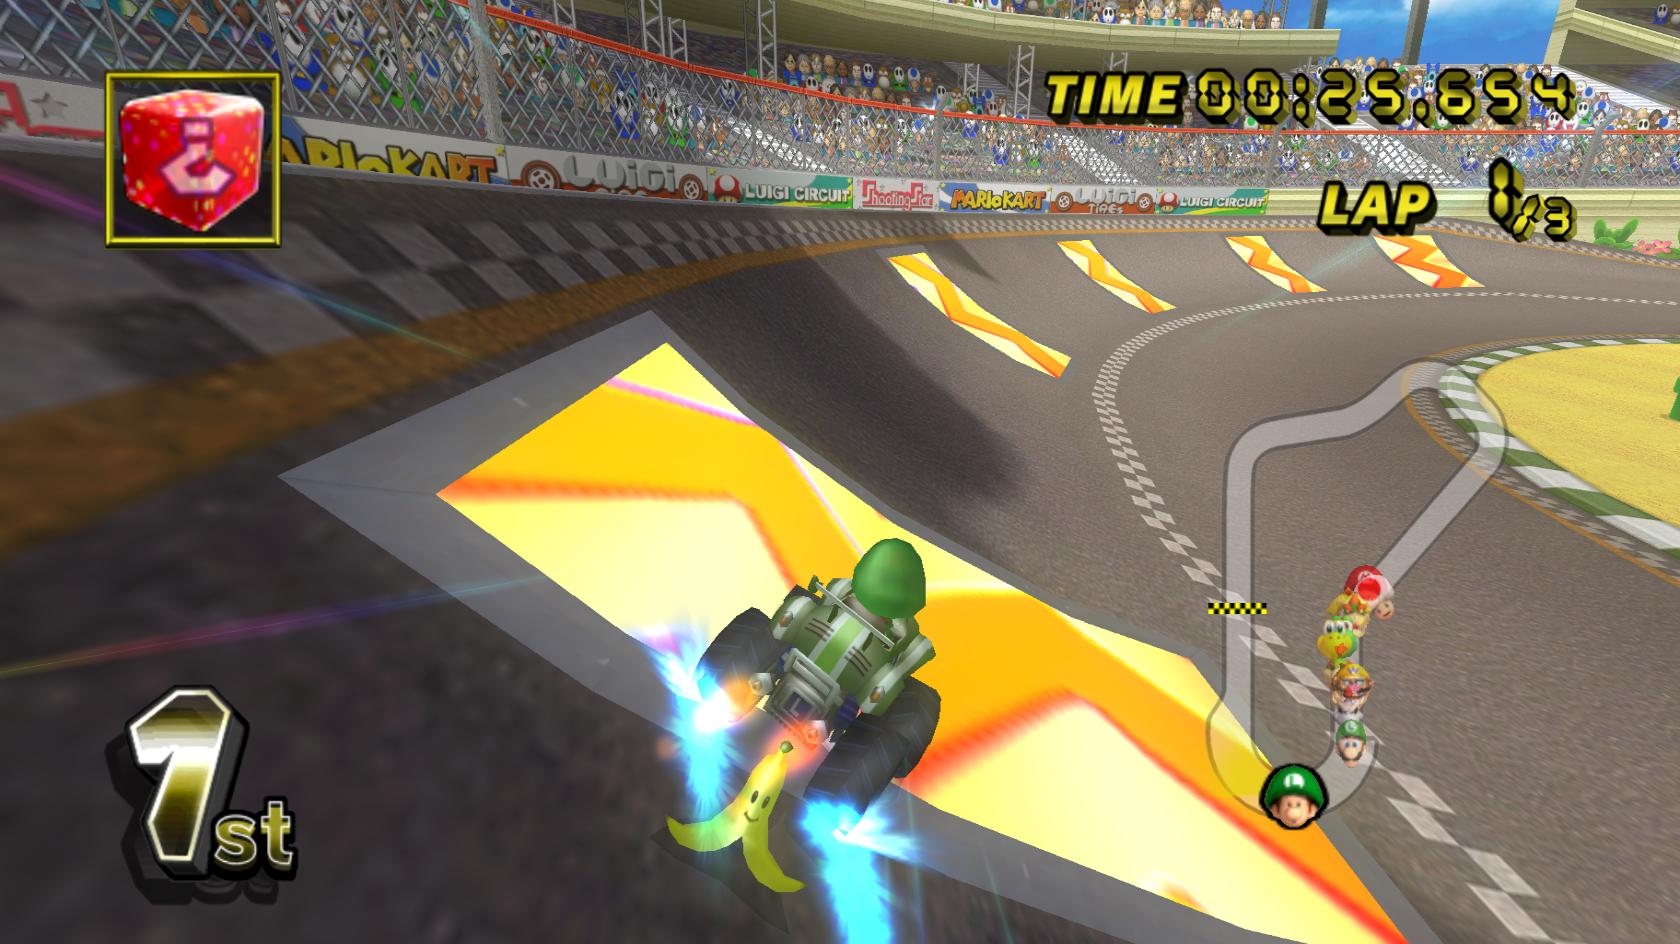 Mario Kart 8 Screenshots A2 Hd Desktop Wallpapers 4k Hd